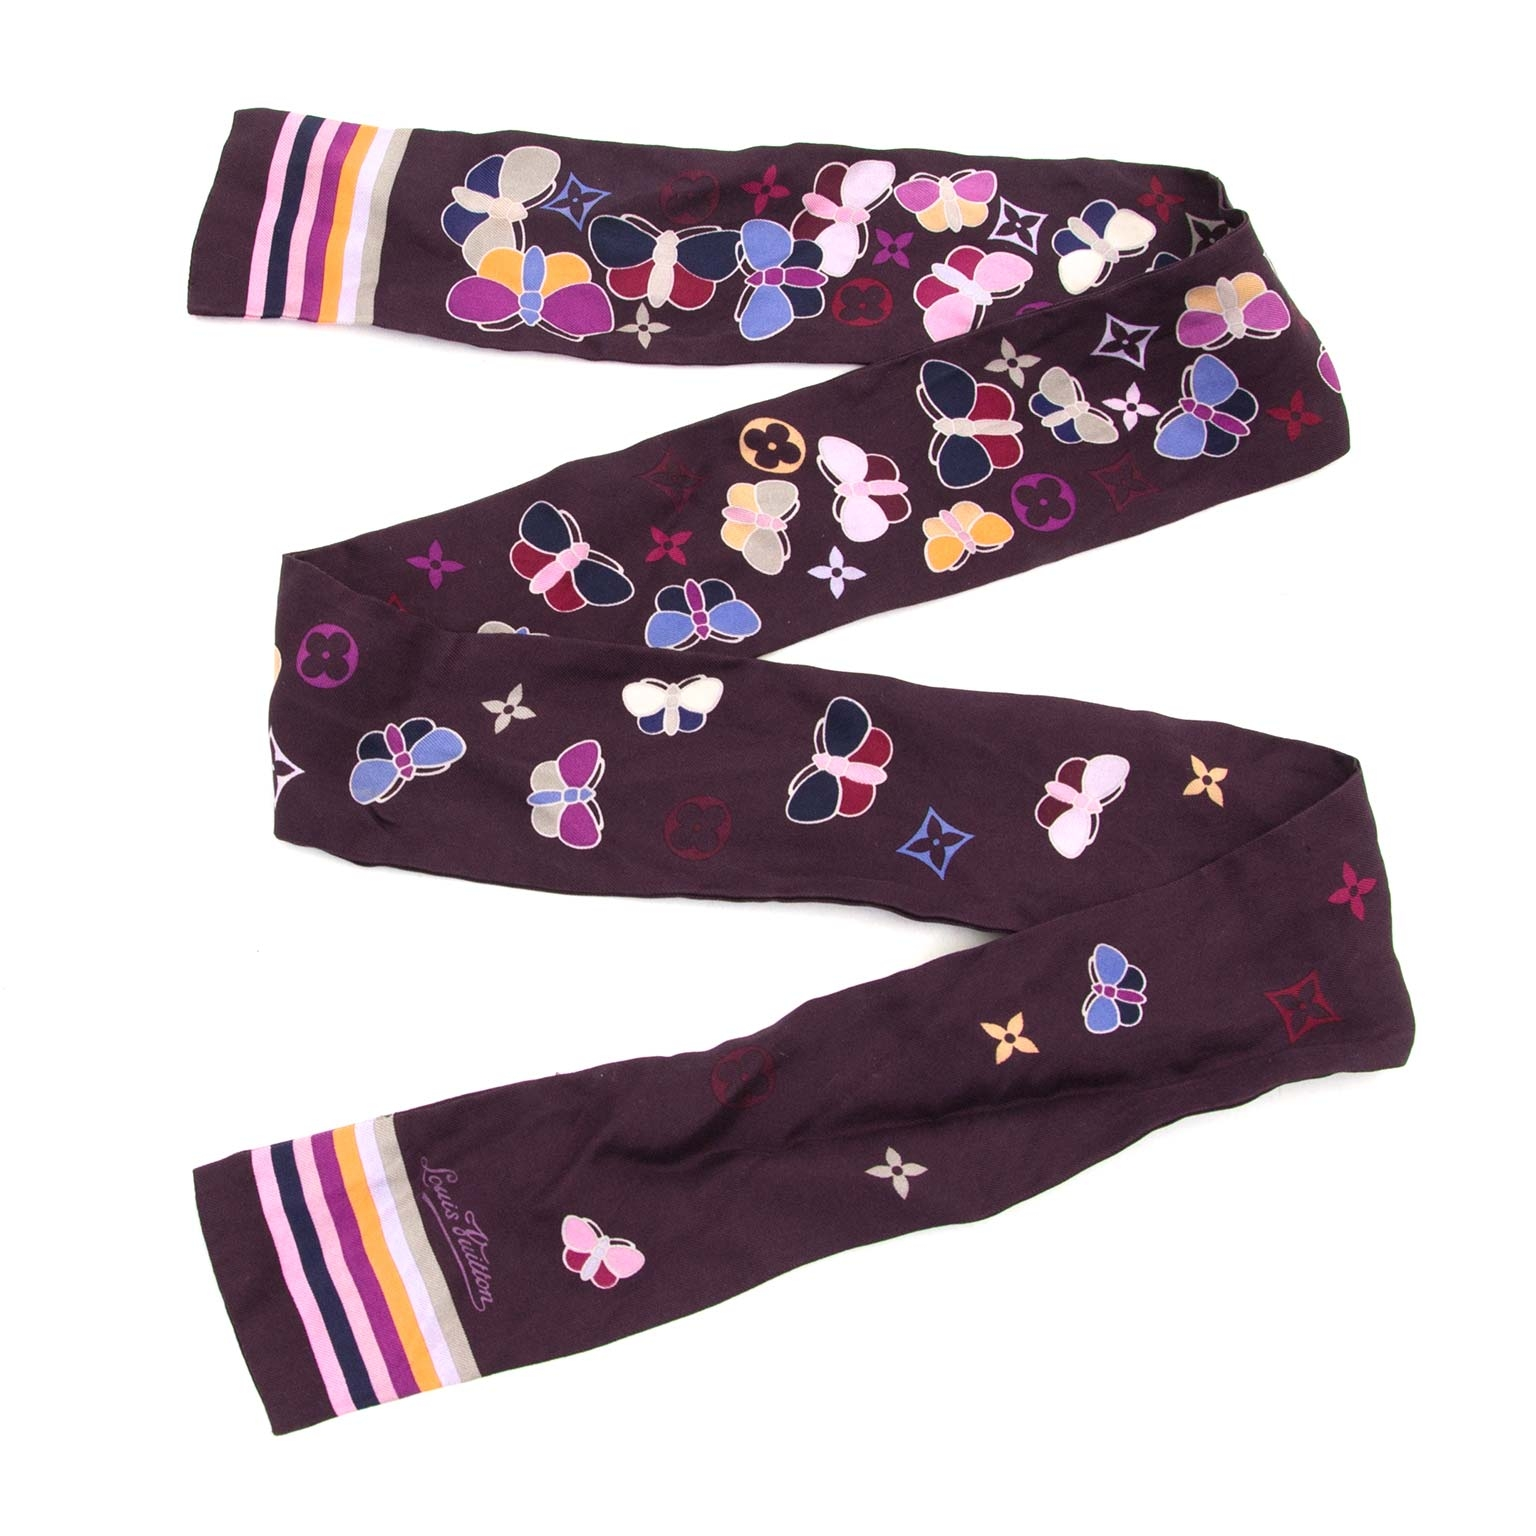 louis vuitton silk purple twilly now for sale at labellov vintage fashion webshop belgium